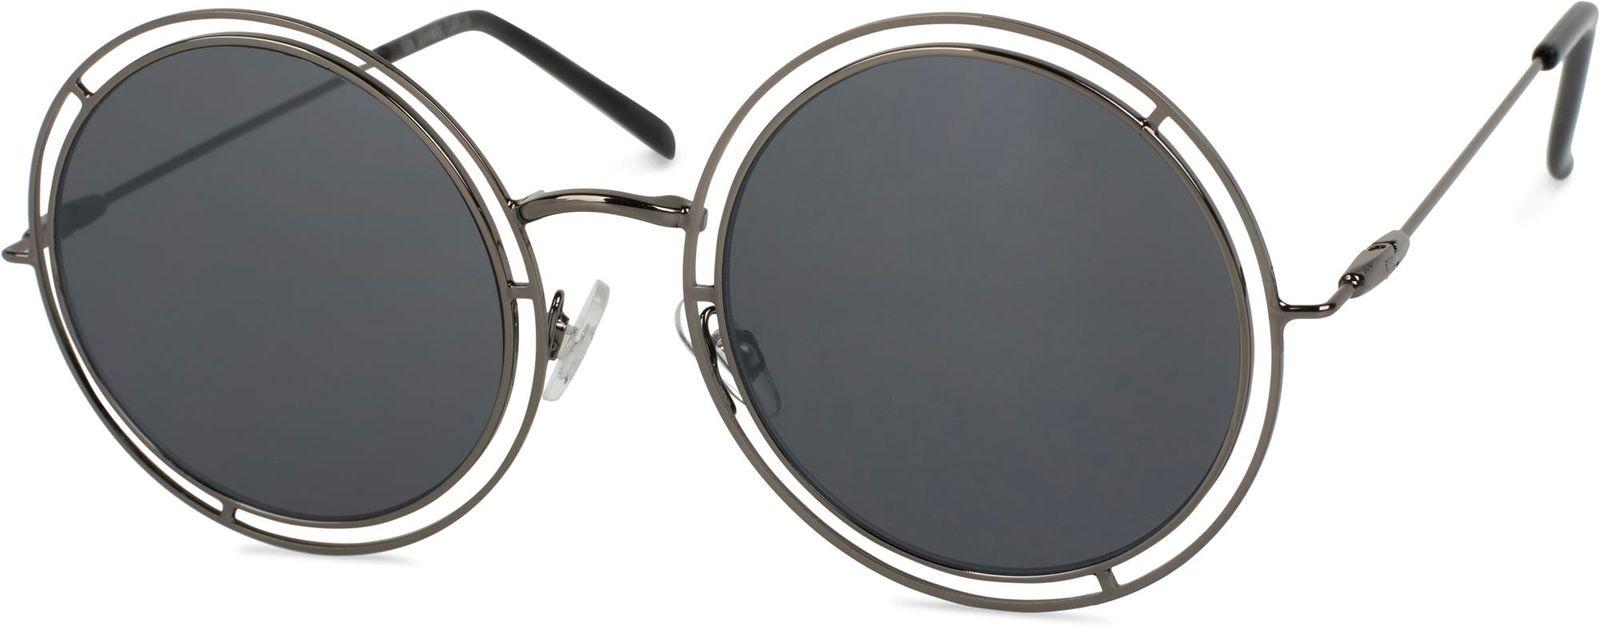 sonnenbrille mit runden gl sern doppeltem rahmen 1124. Black Bedroom Furniture Sets. Home Design Ideas